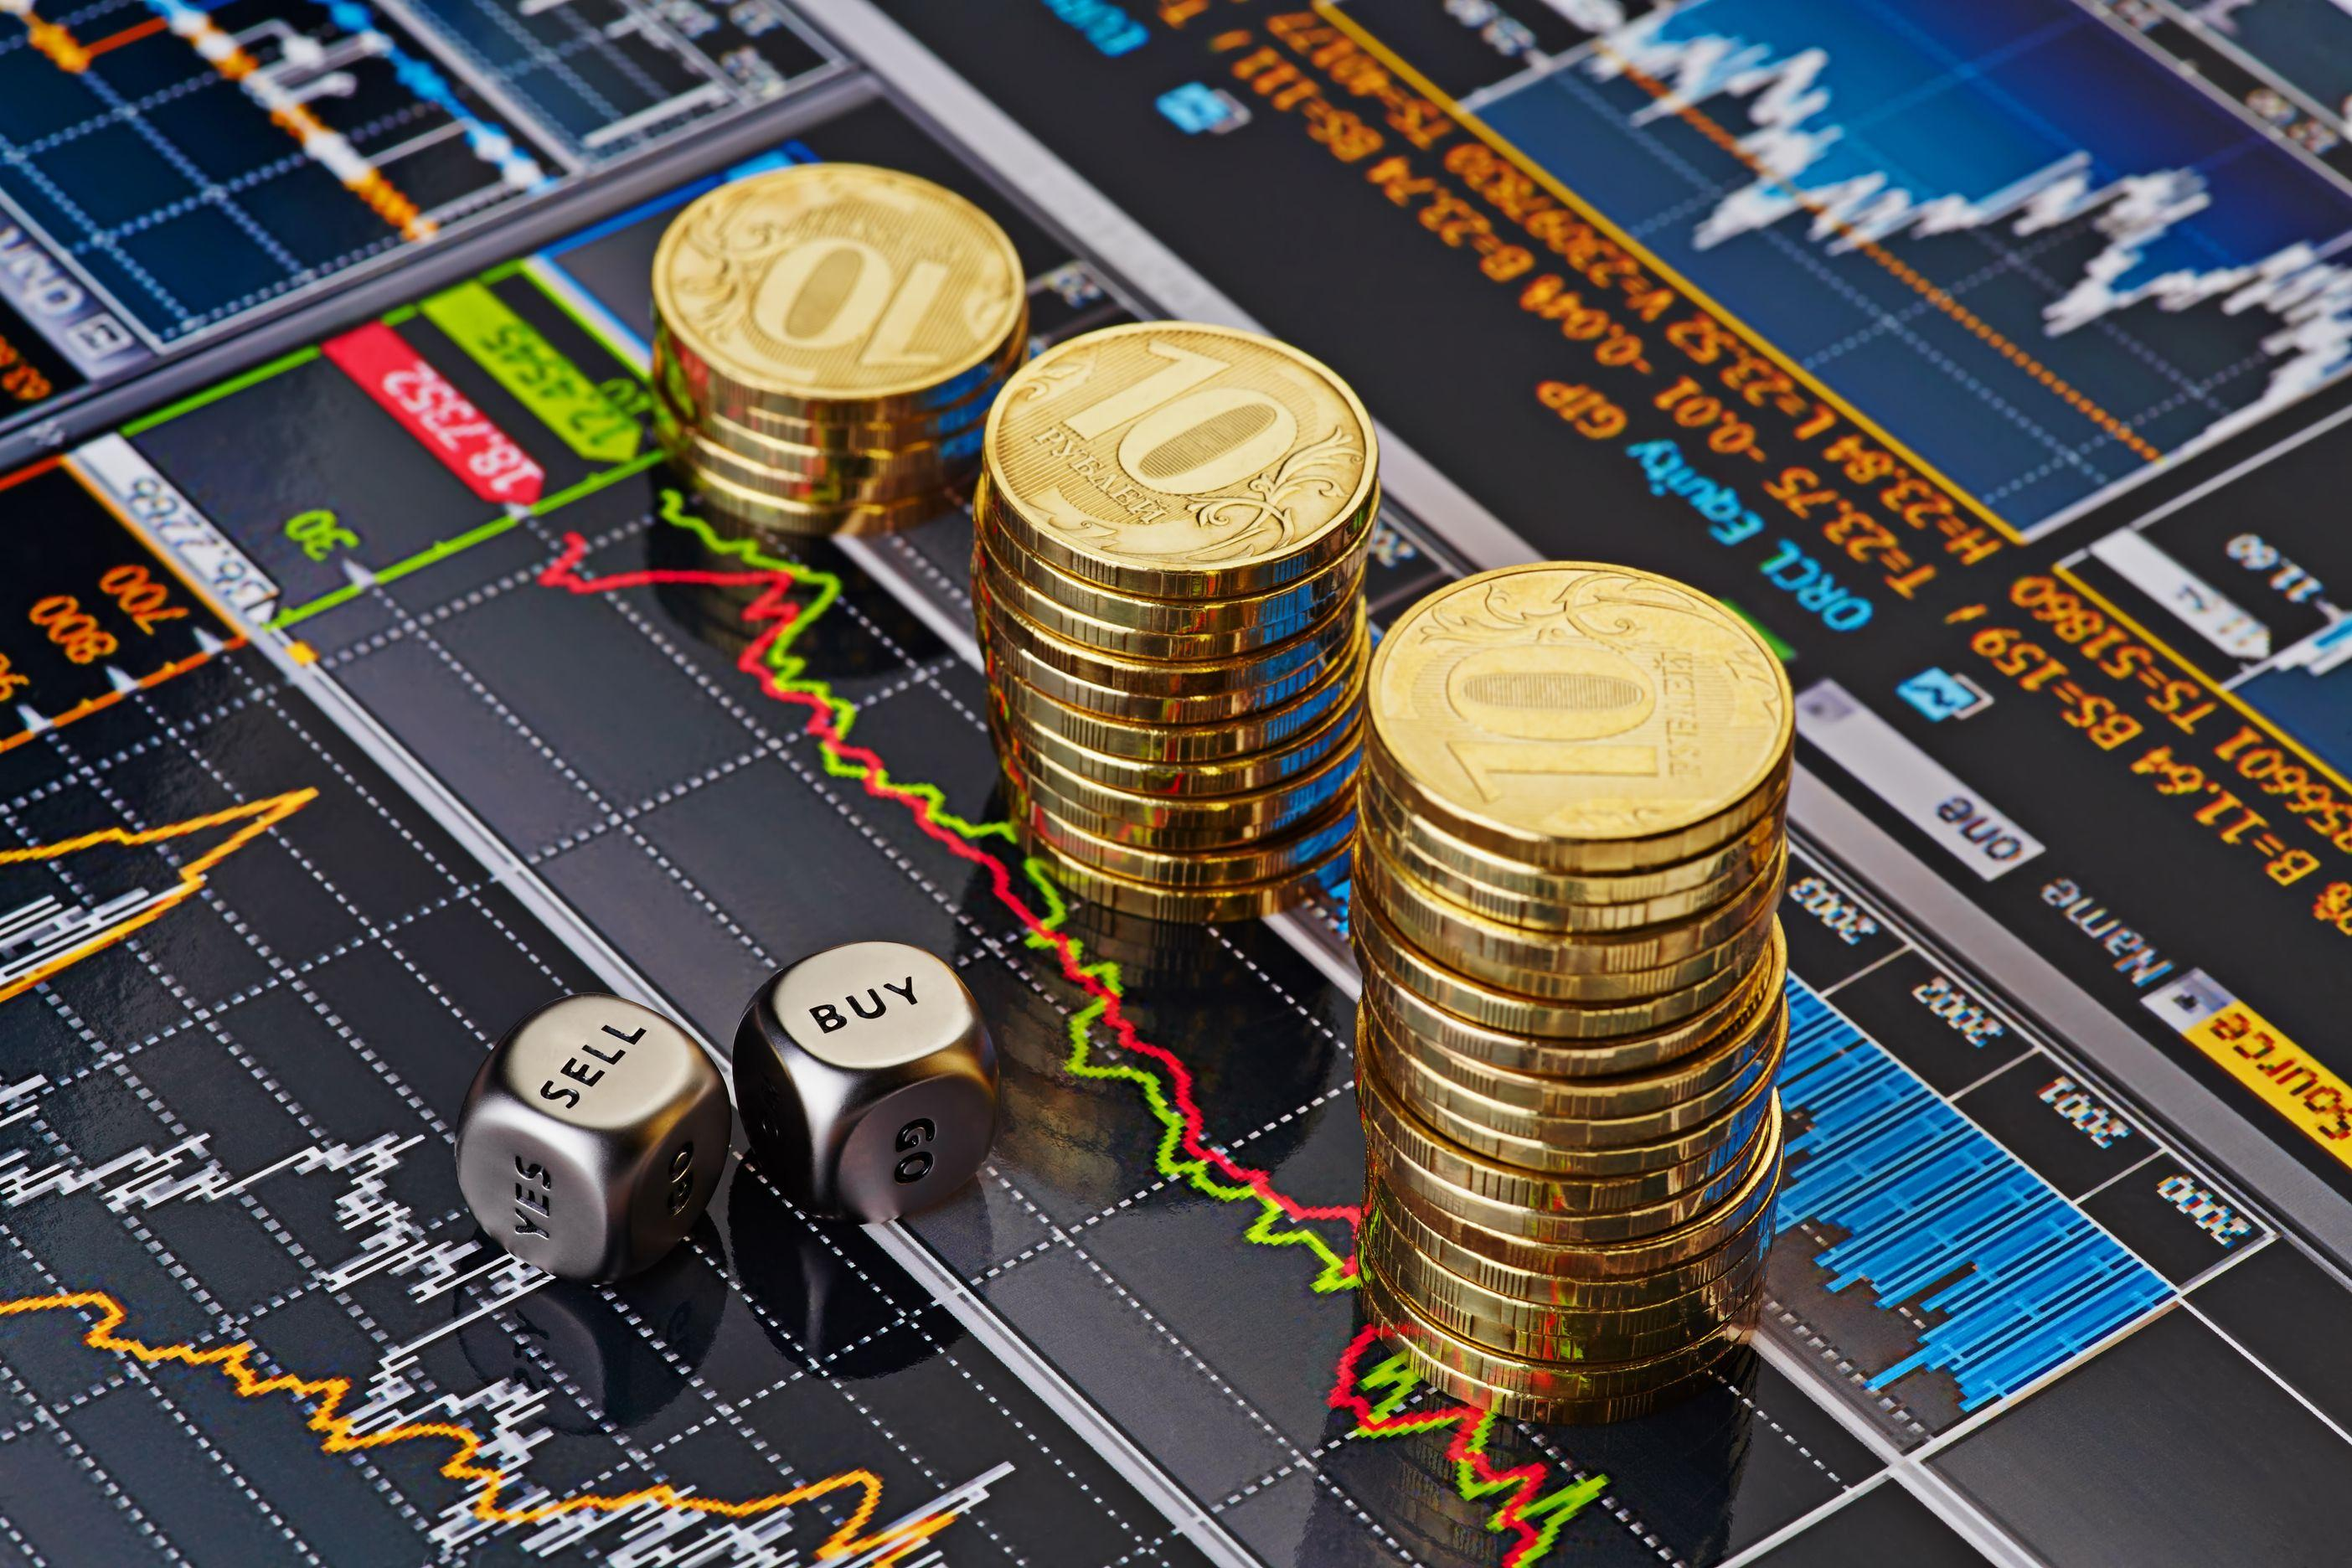 Finance Wallpapers